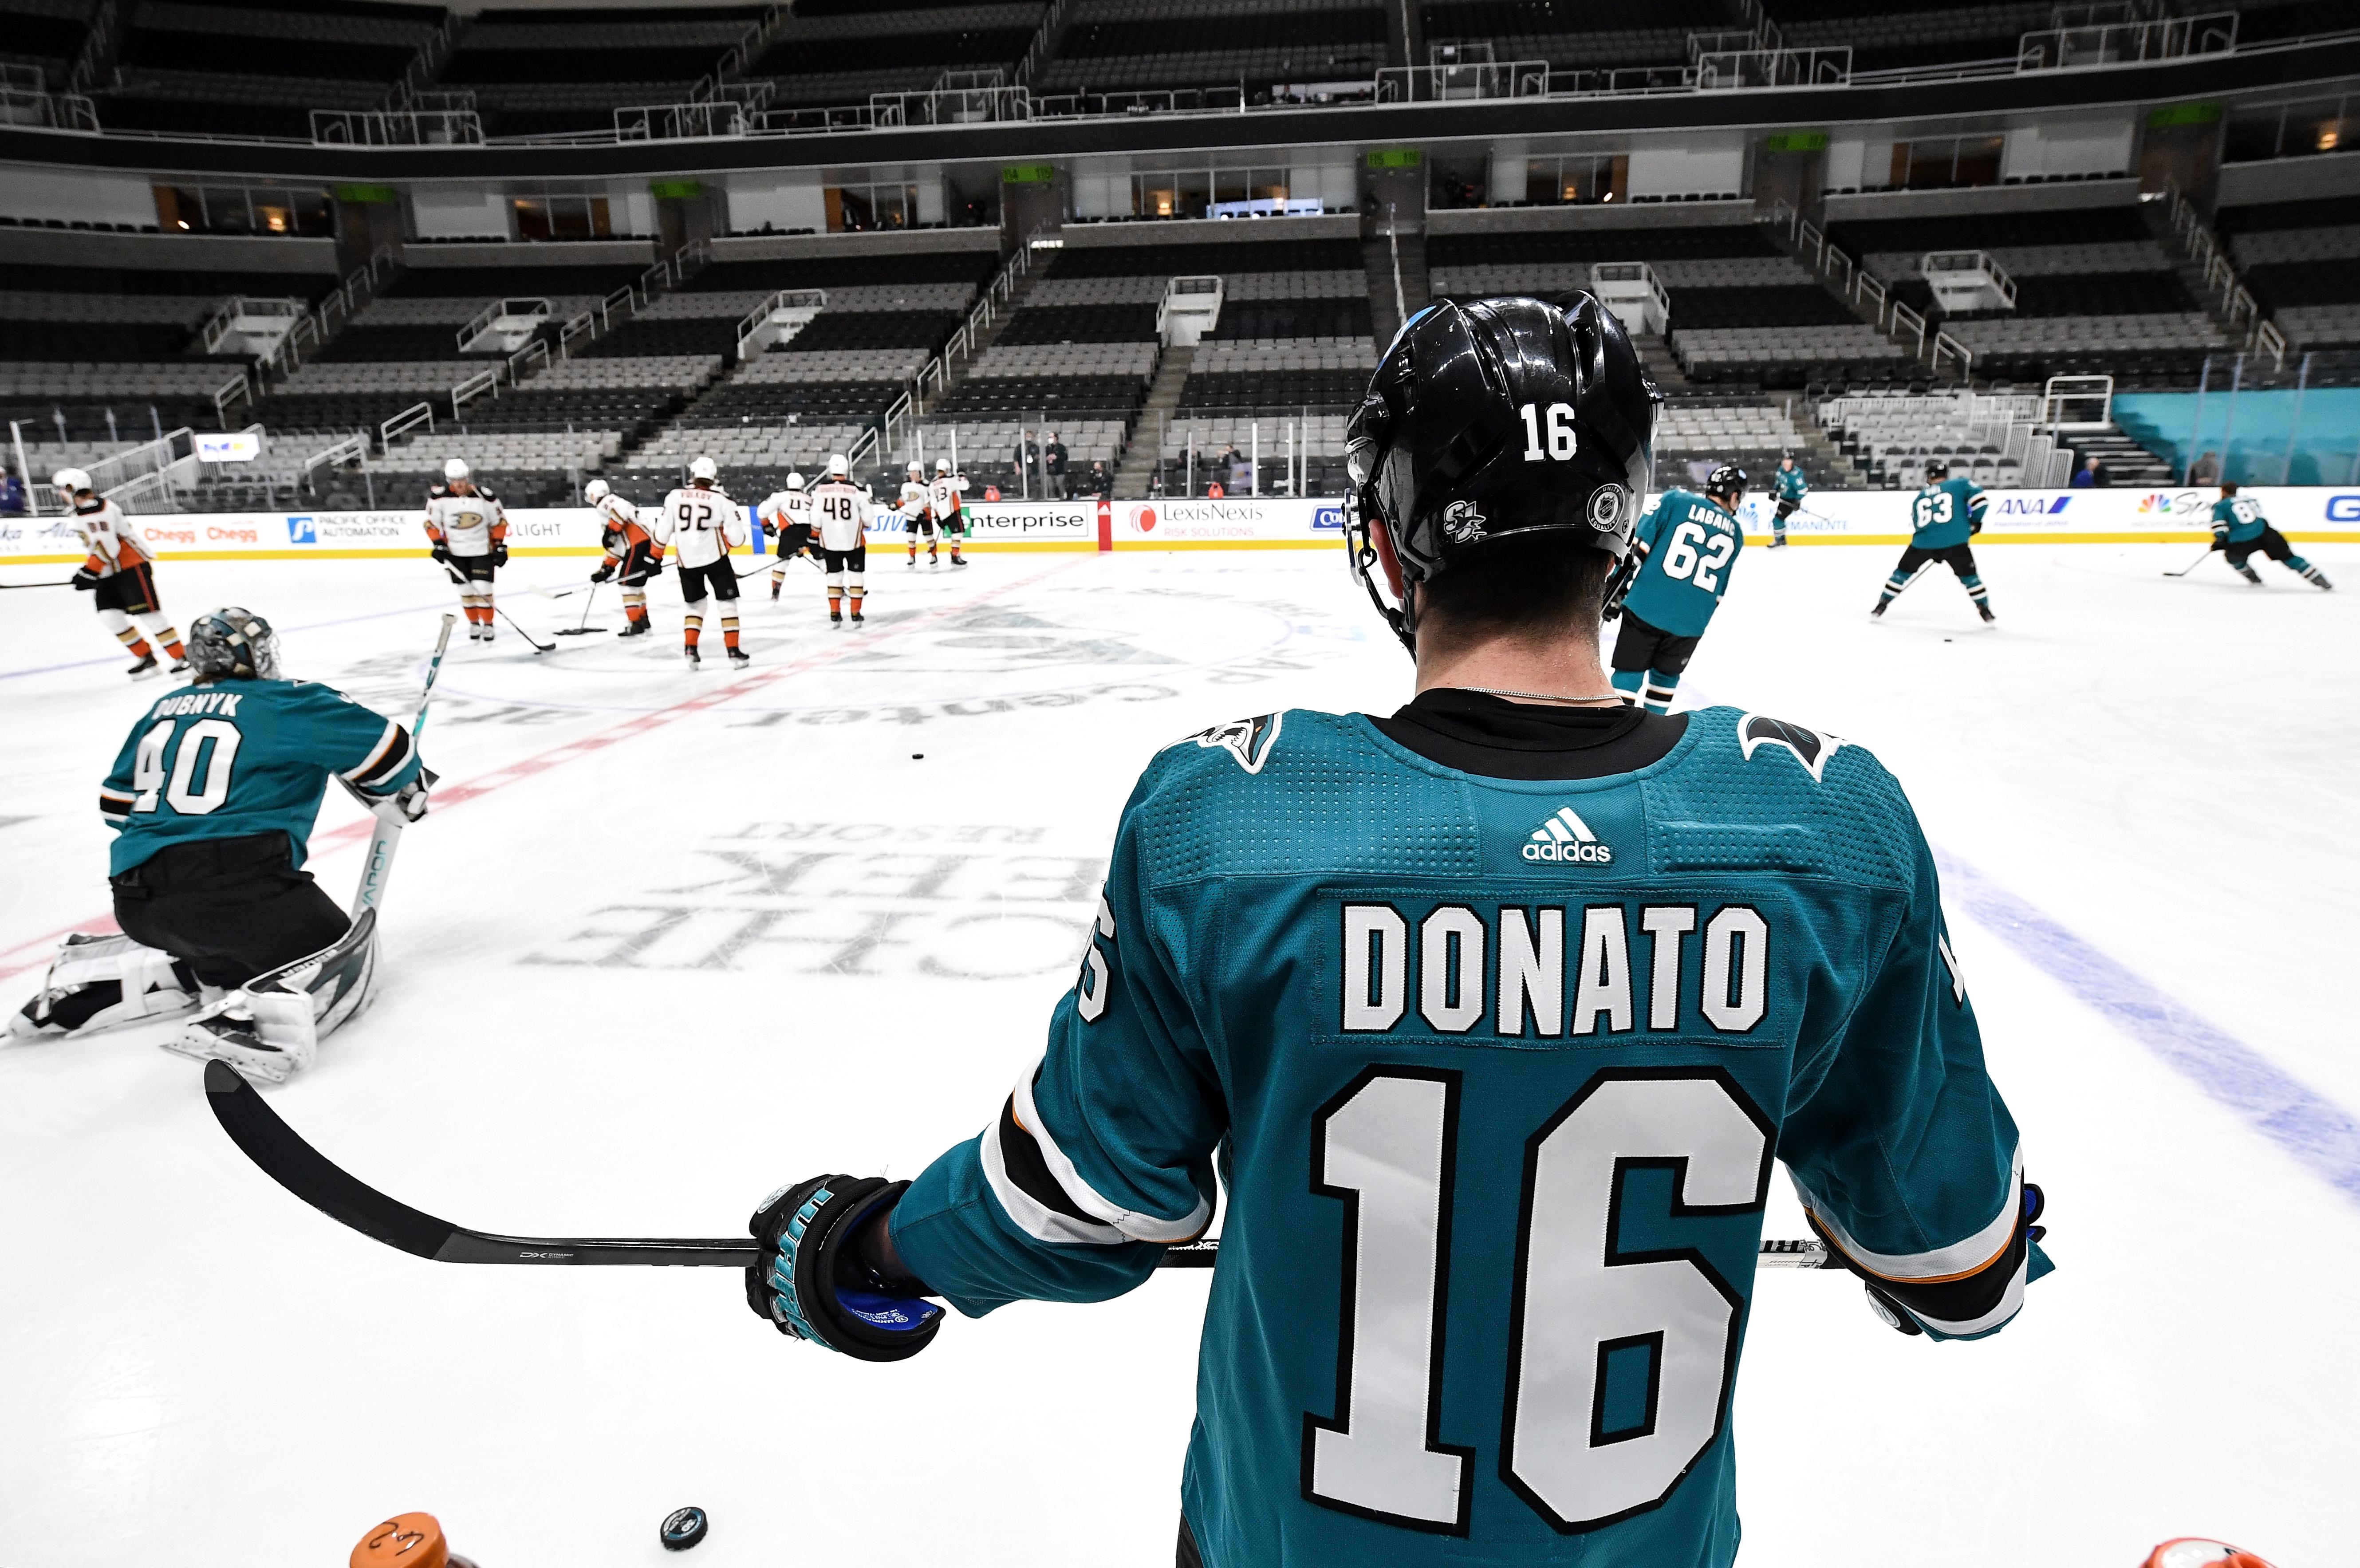 Ryan Donato #16 of the San Jose Sharks warms up before facing the Anaheim Ducks at SAP Center on April 6, 2021 in San Jose, California.